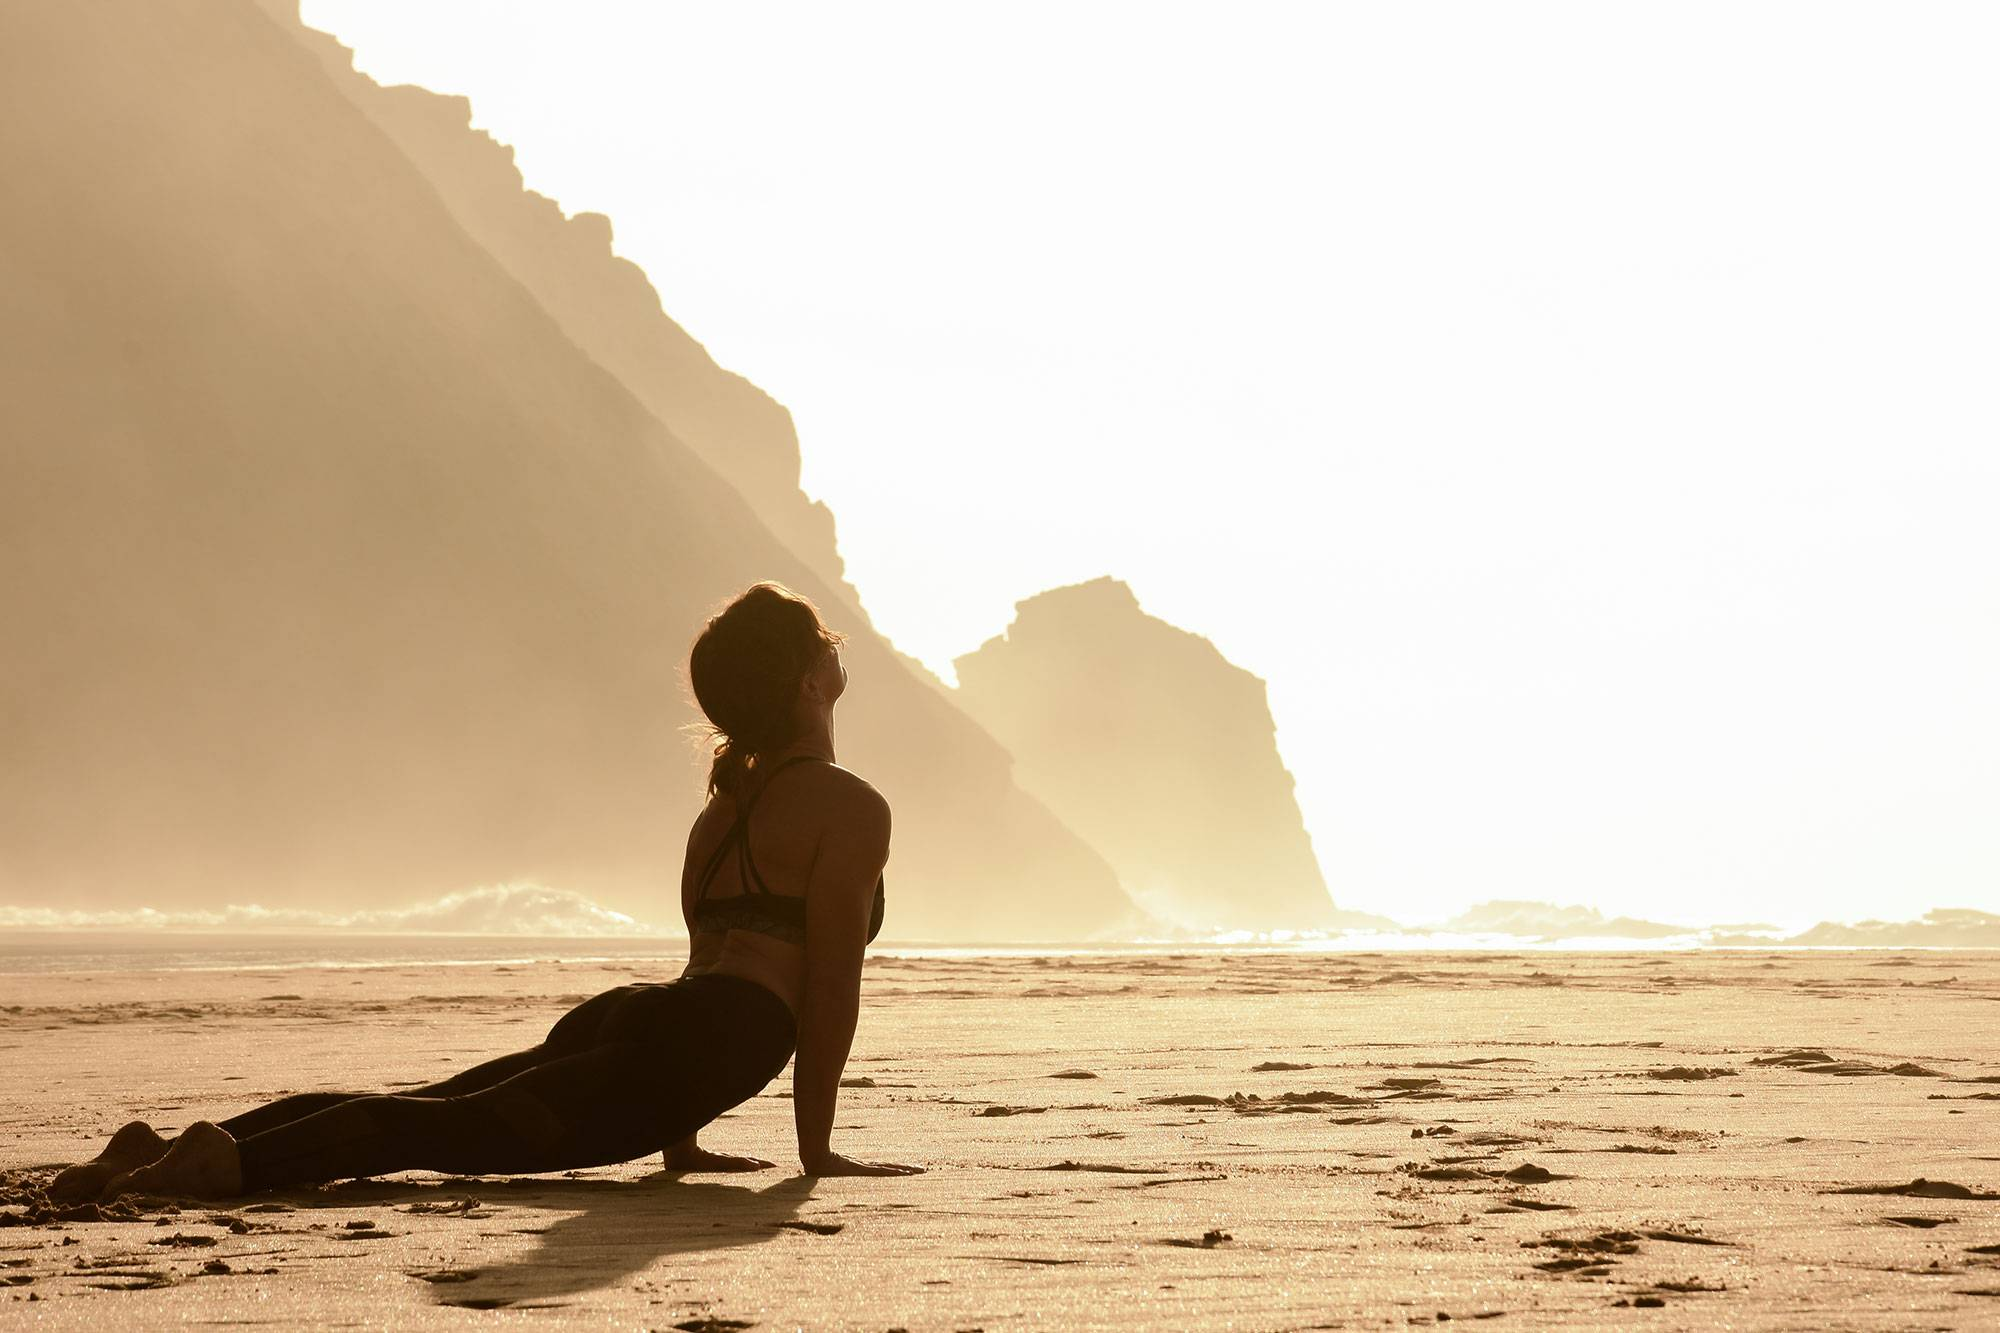 https://www.soulandsurf.com/wp-content/uploads/2021/07/retreatsportugal-images@katiearaephoto_Yoga_On-the-beach_Rach.jpg